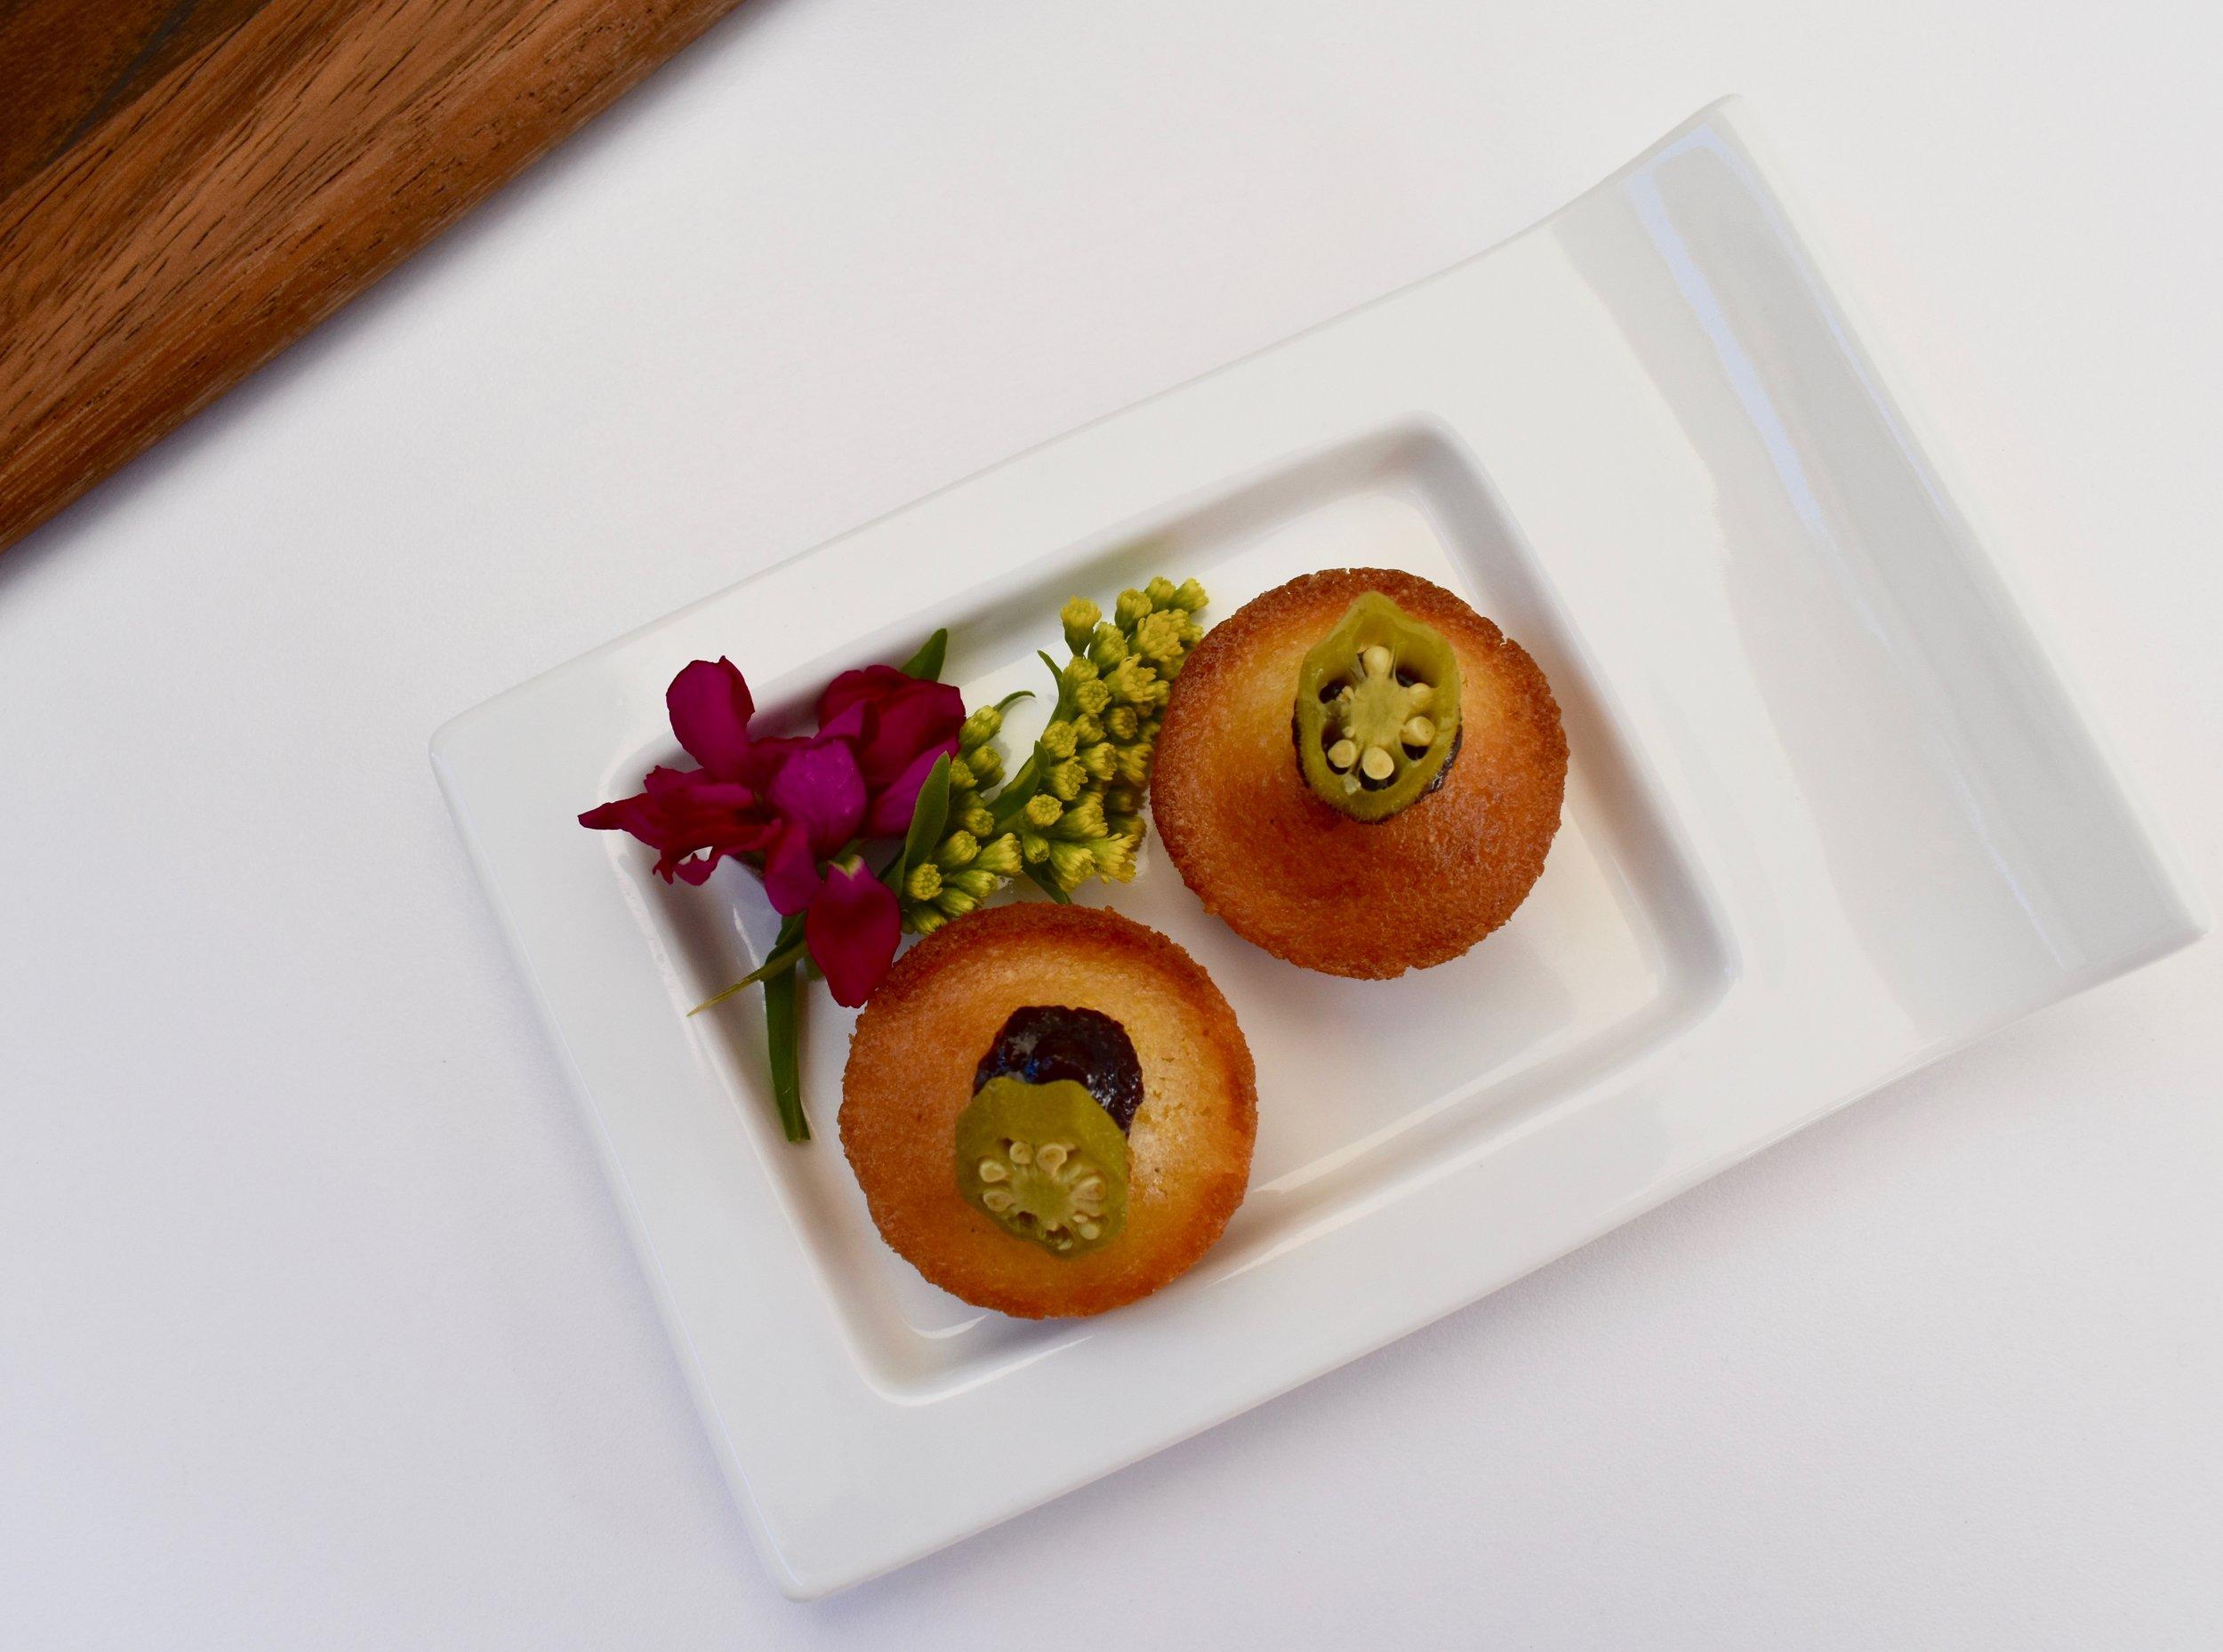 Miniature Corn Bread Muffins